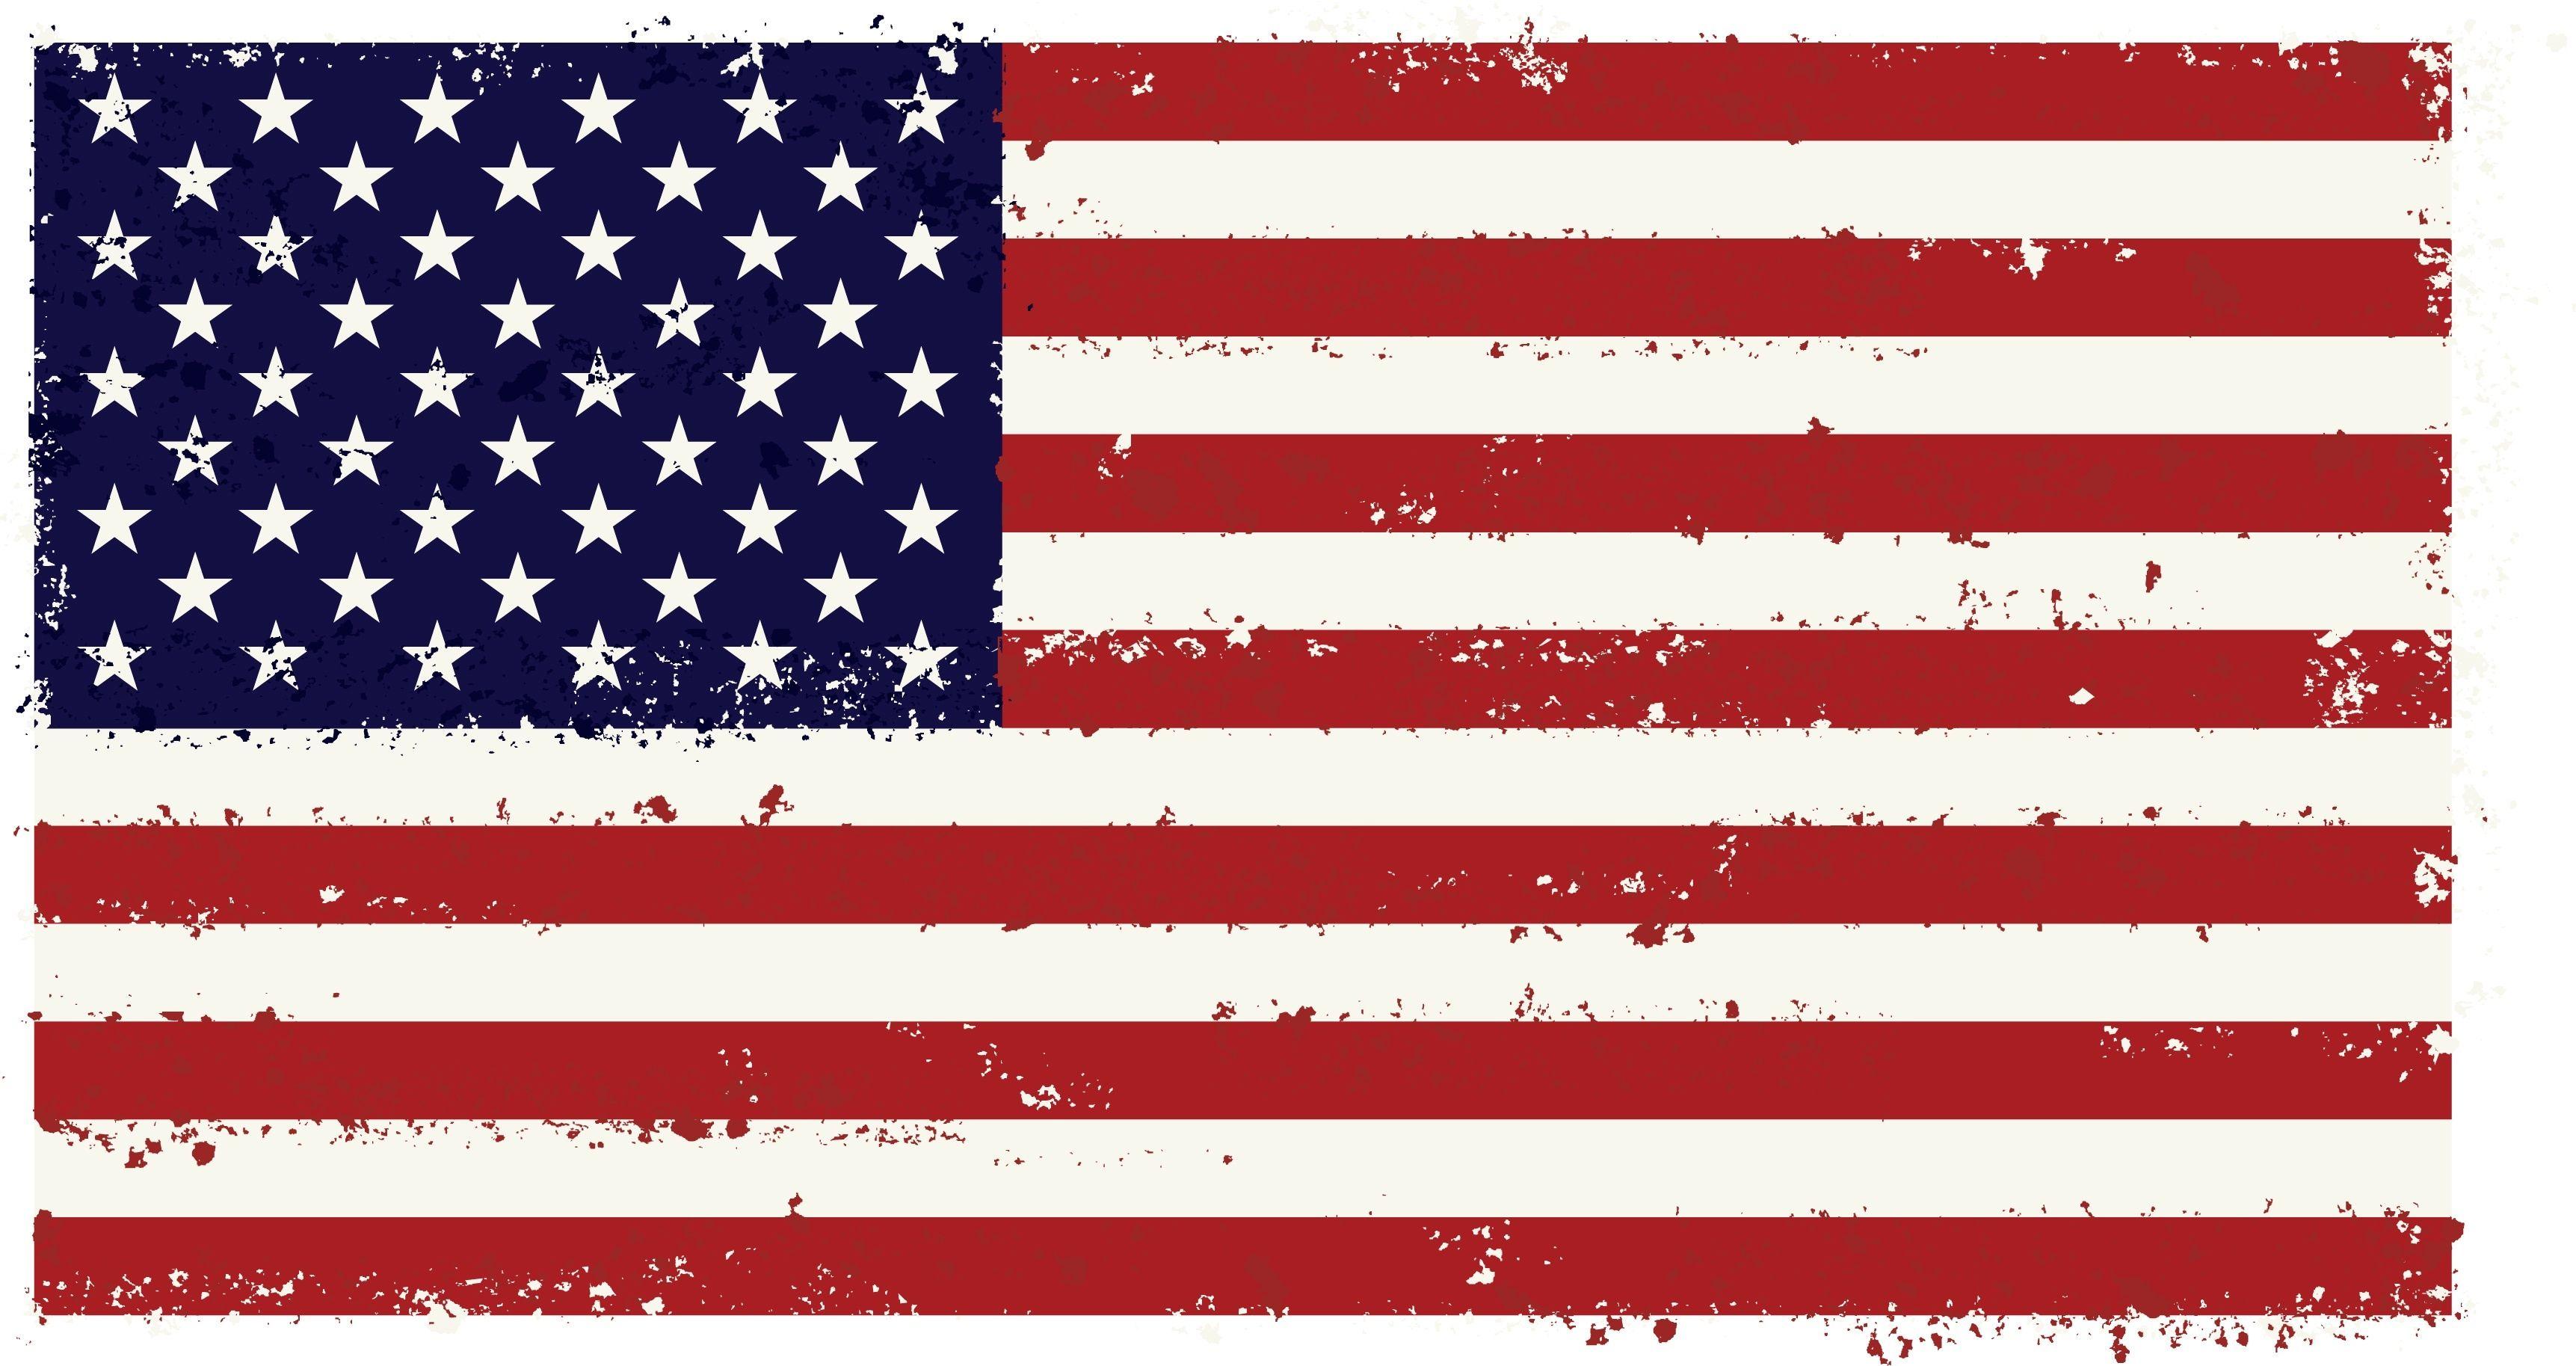 Download Wallpaper White Red Strip Flag Usa U S A The America Flag Wallpaper American Flag Images American Flag Wallpaper